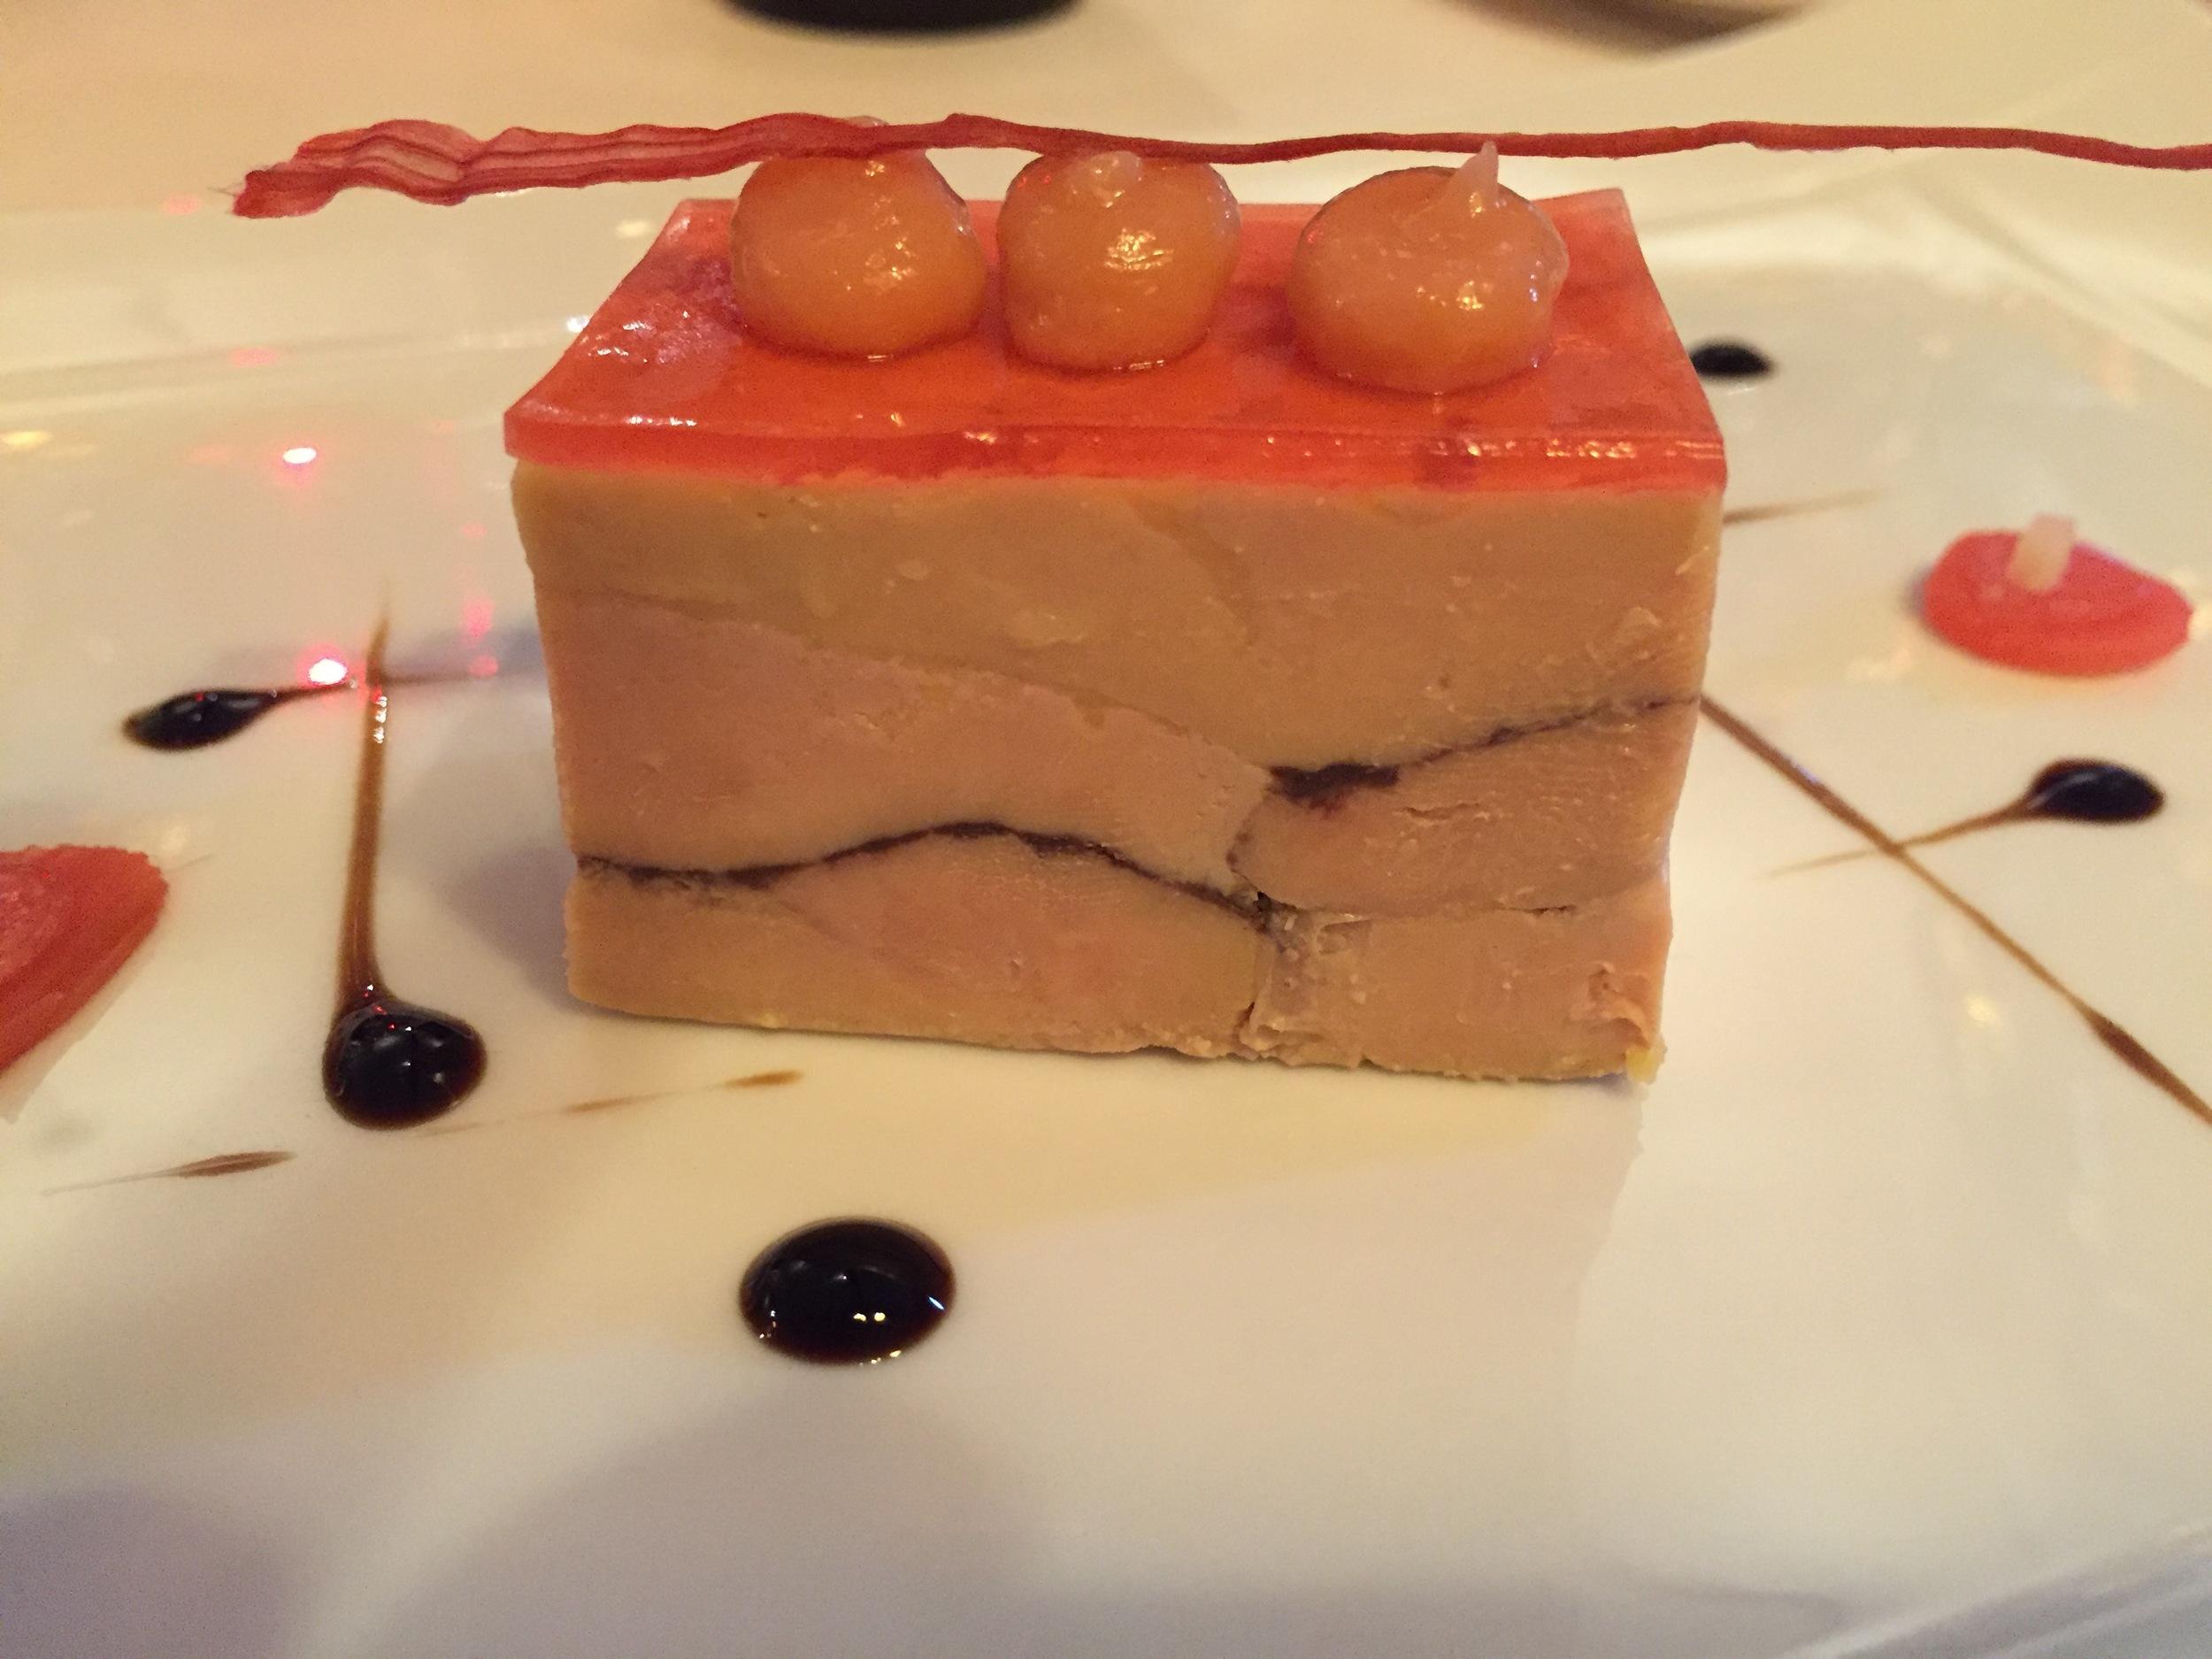 More foie gras? Yes, please...